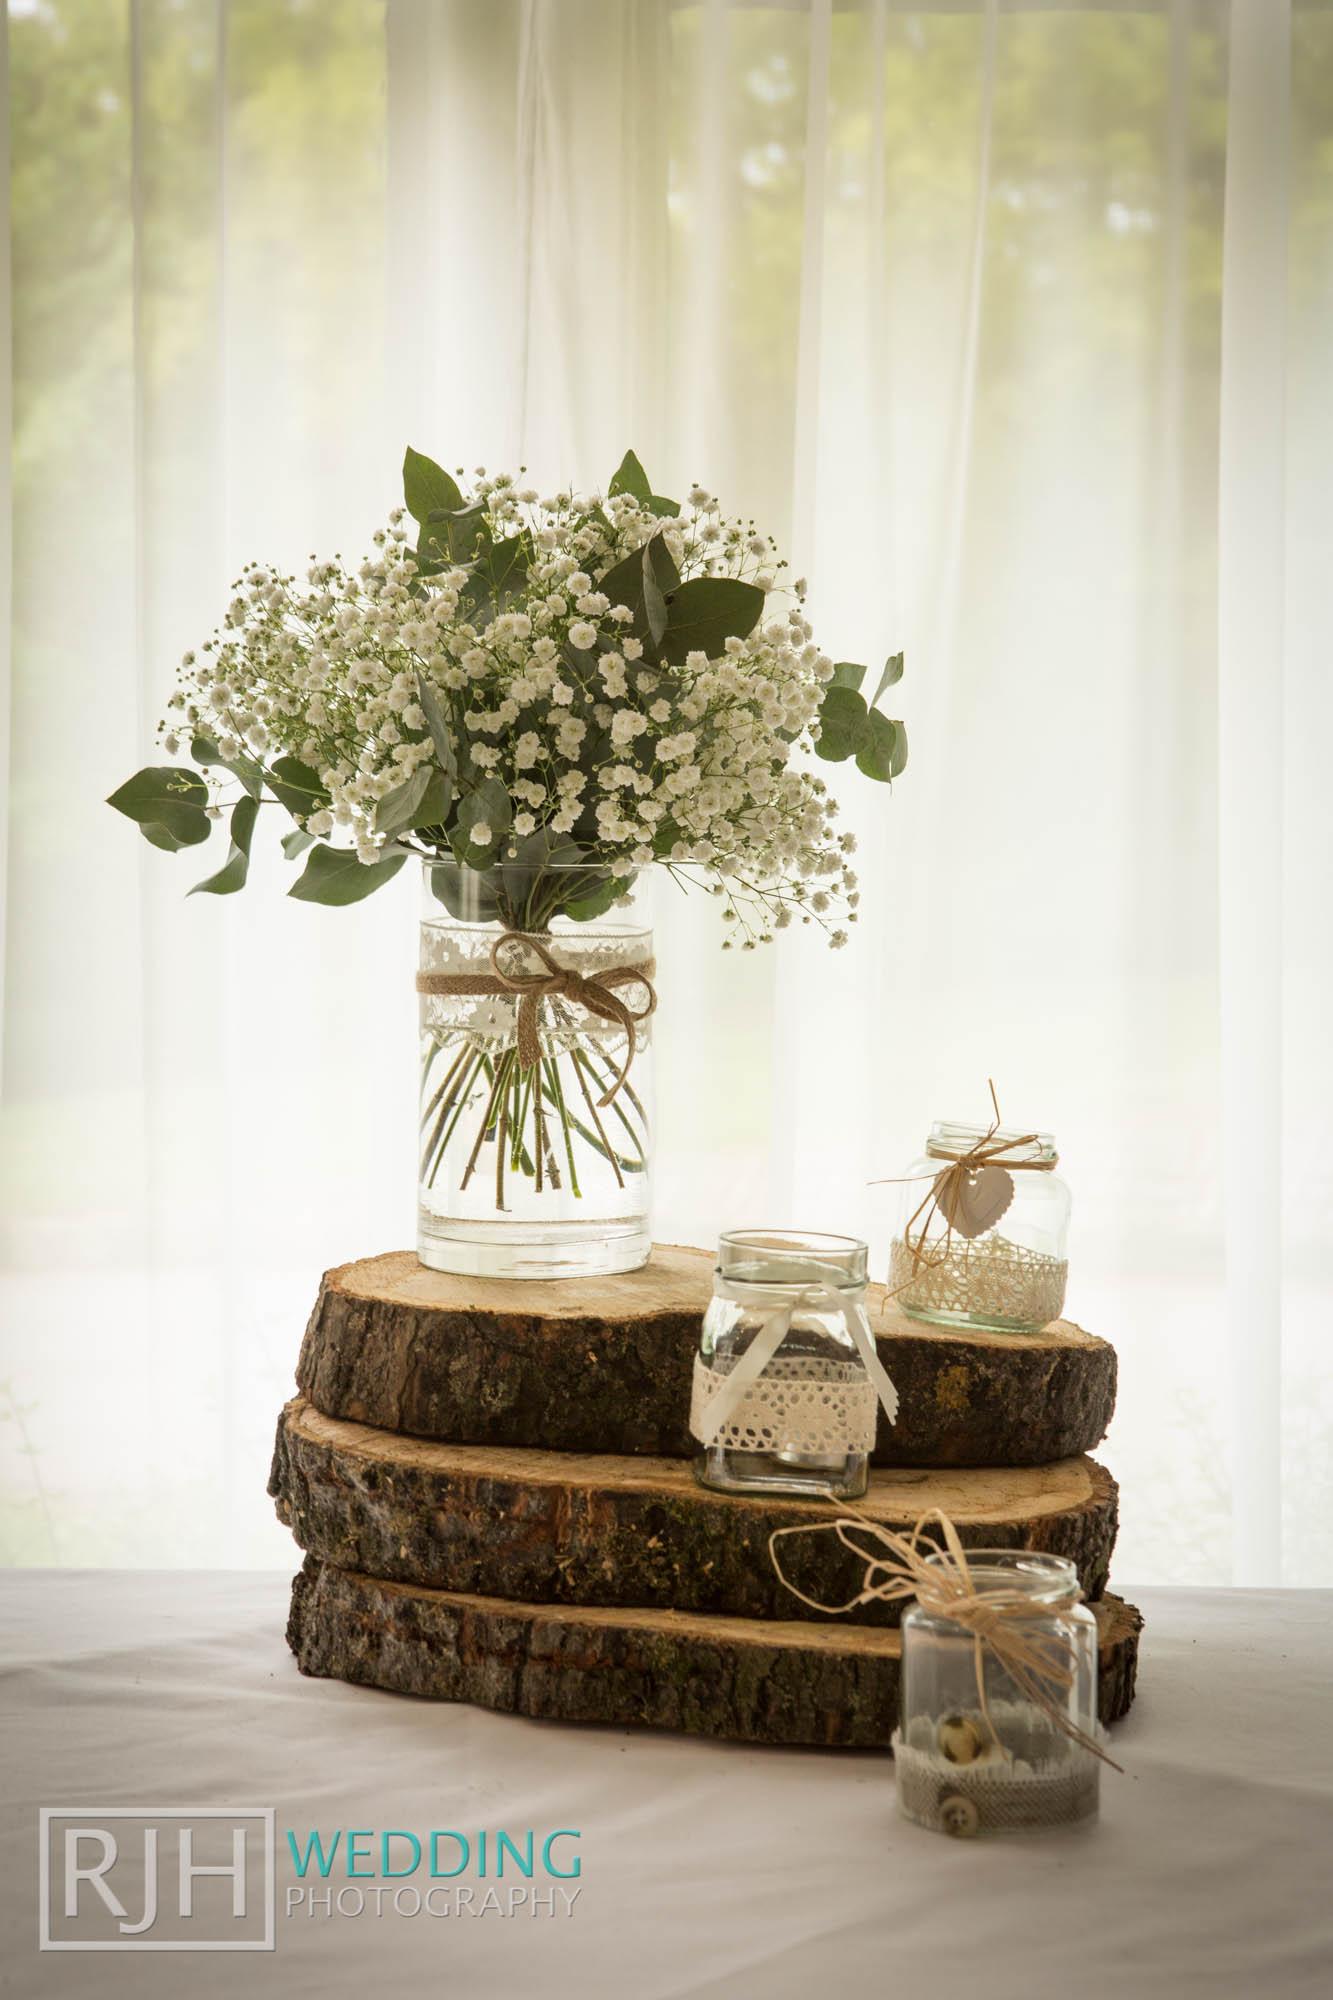 Whitley Hall Marples Wedding_9_3C2A8376.jpg